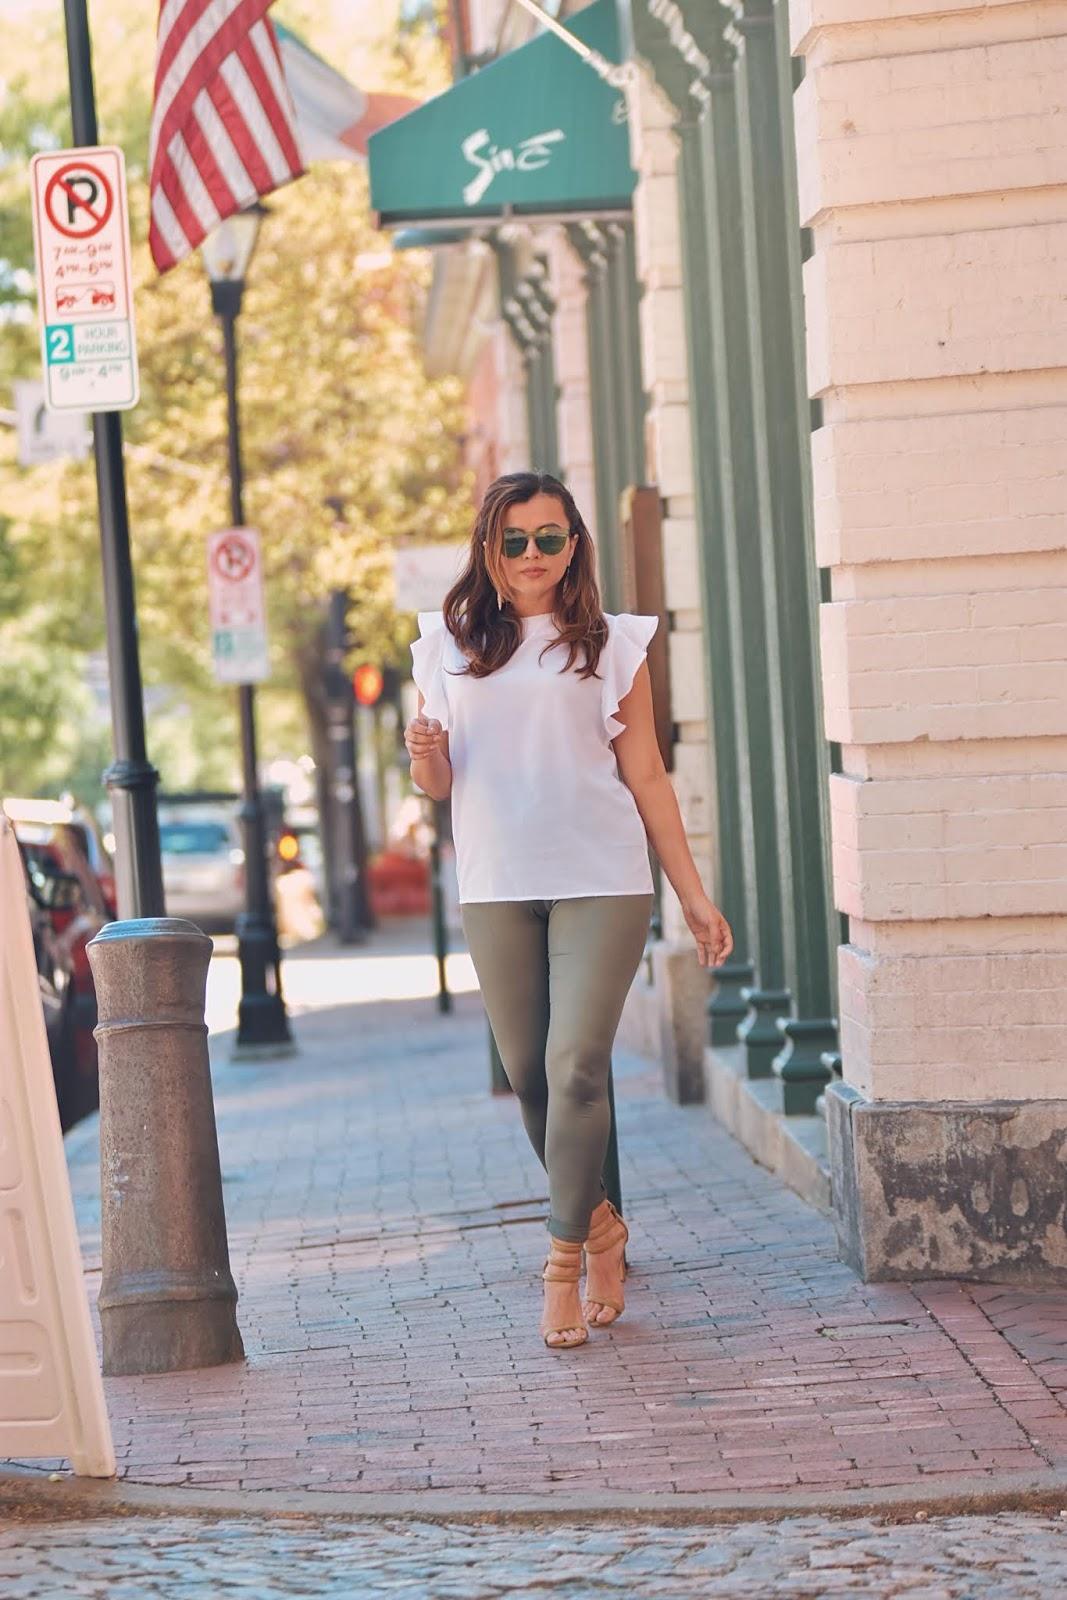 Leather Look Leggings-MariEstilo-luxegal-fashionblogger-streetstyle-fashionista-modaelsalvador-dcblogger-marisolflamenco-